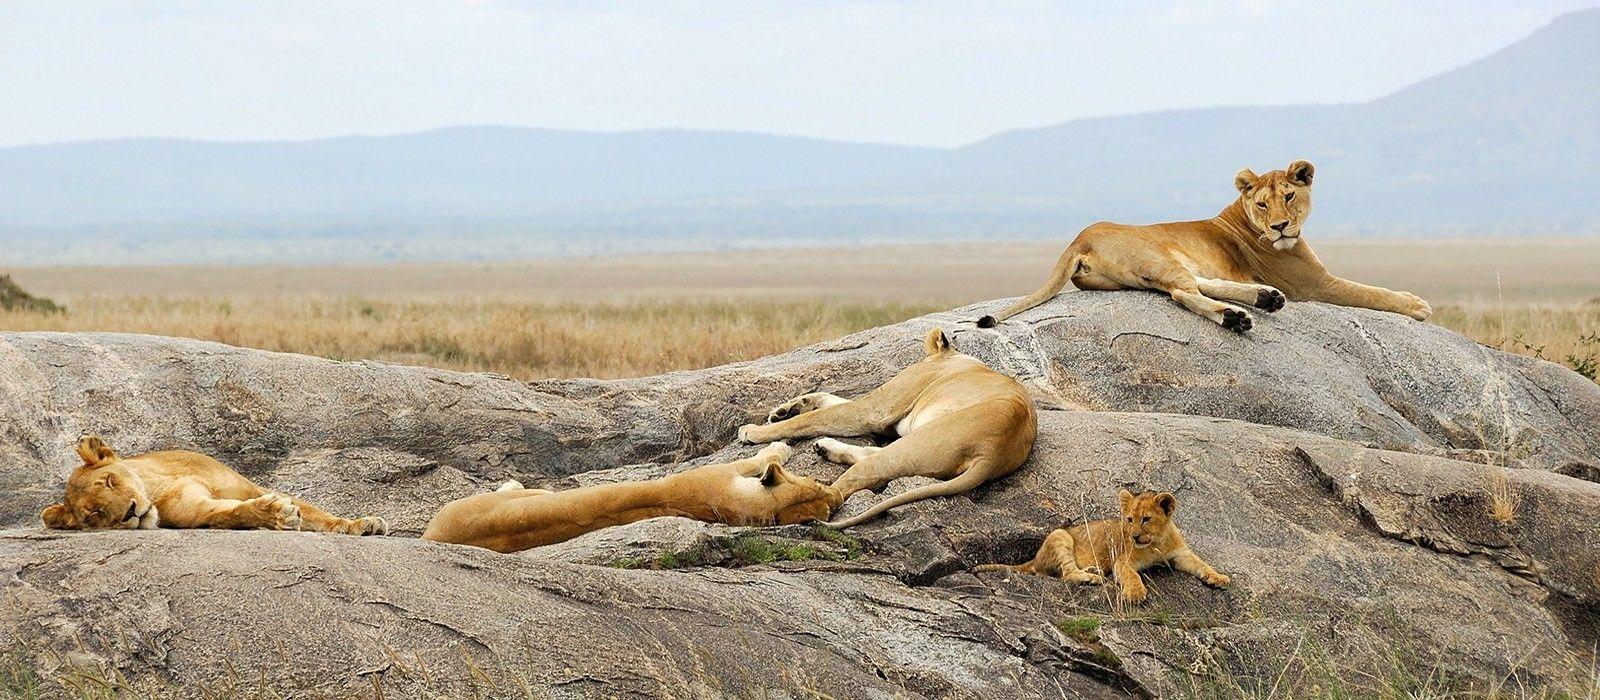 Lakeside Luxury, Wilderness and Wildlife in Tanzania Tour Trip 2